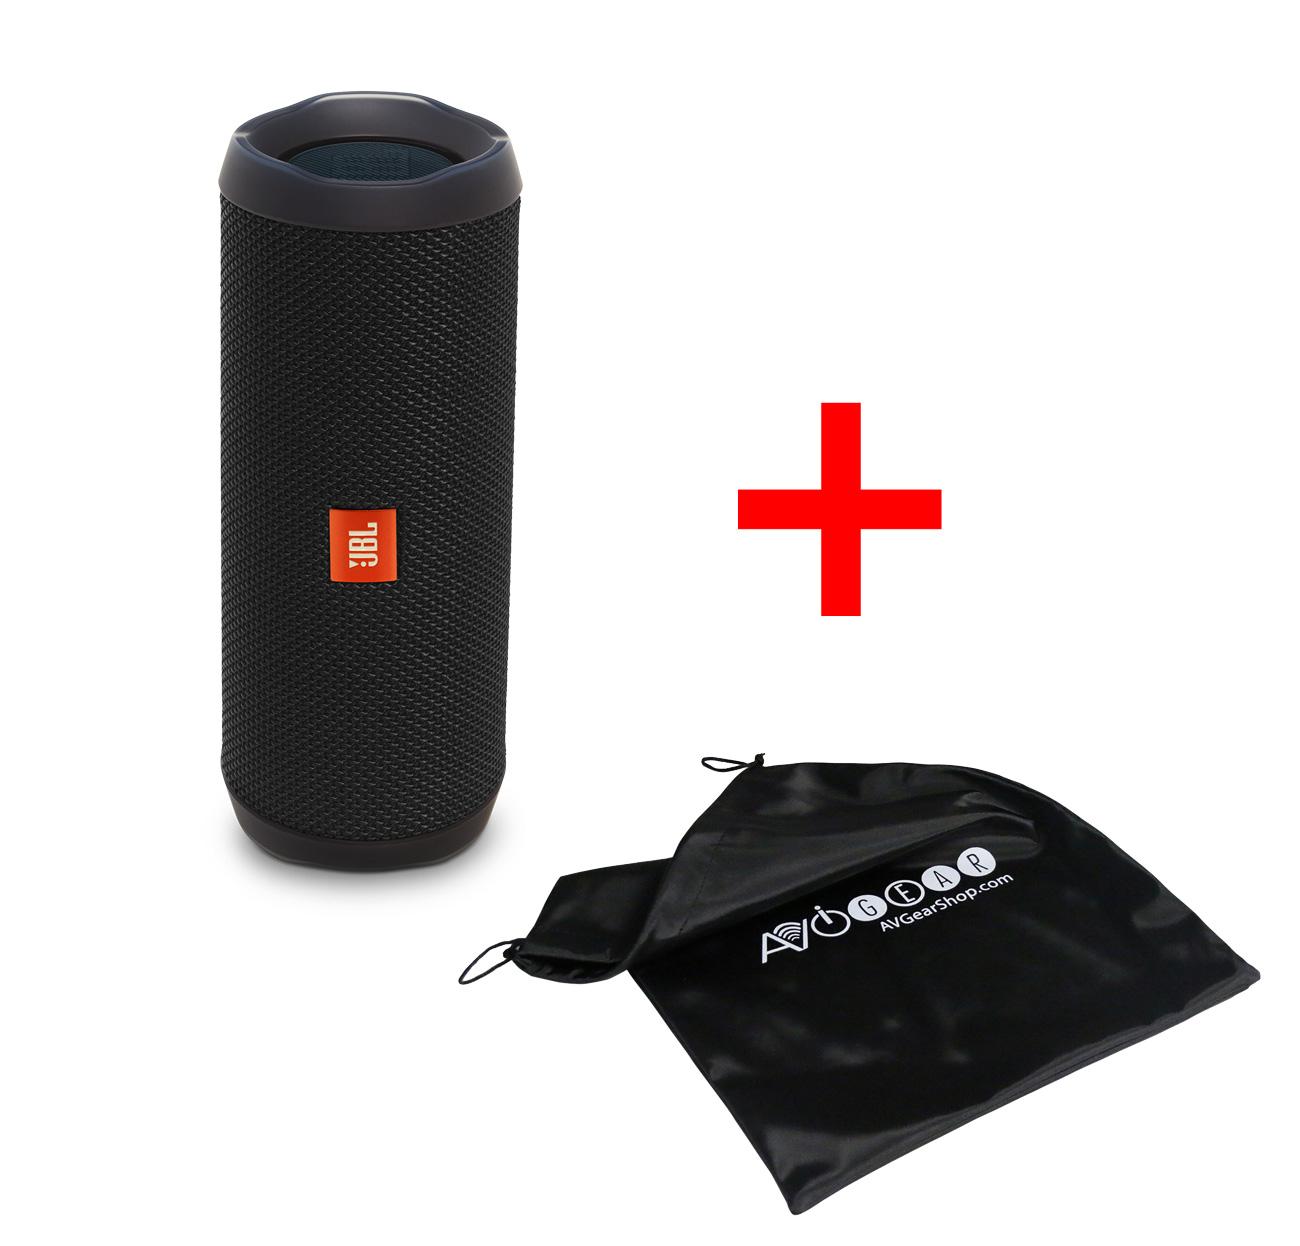 jbl flip 4 waterproof portable bluetooth speaker black. Black Bedroom Furniture Sets. Home Design Ideas